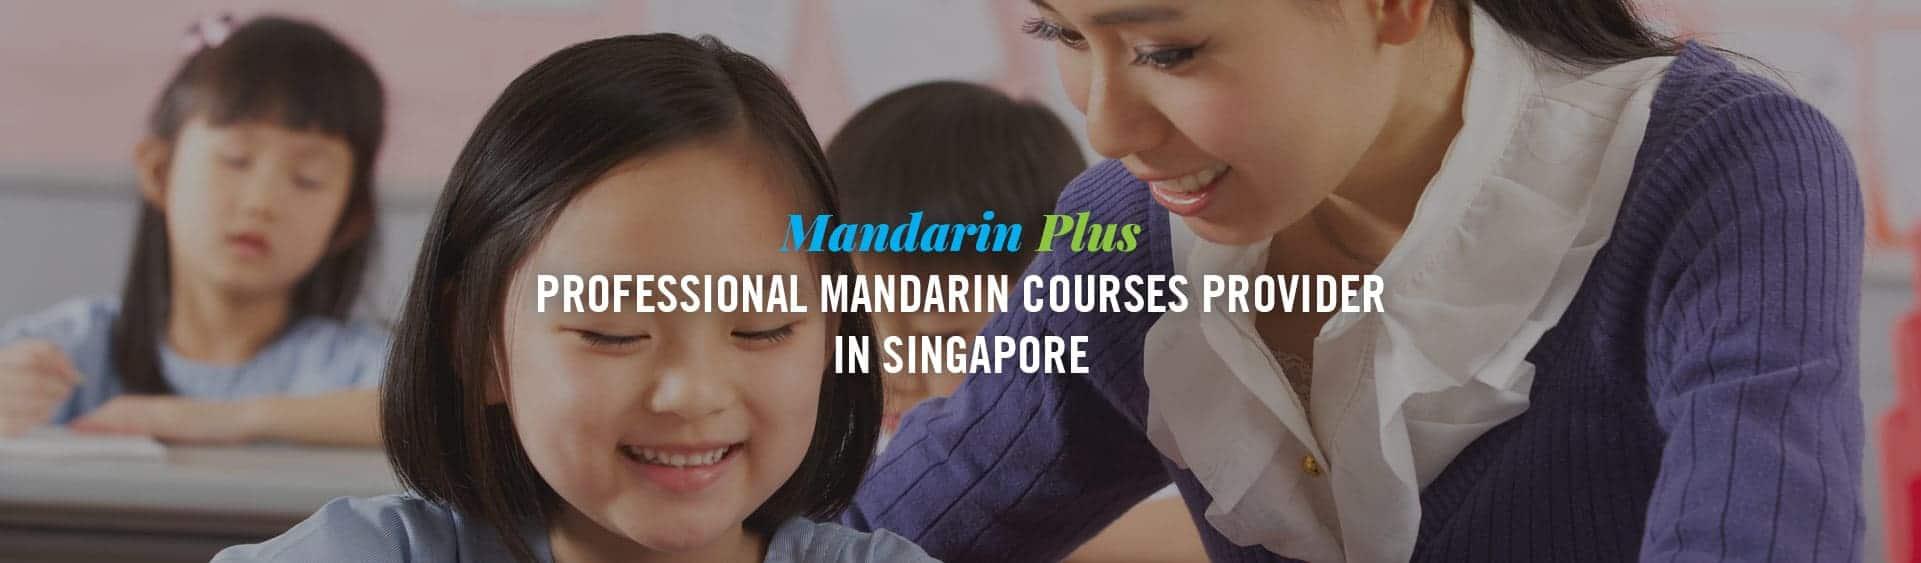 Mandarin Plus Banner